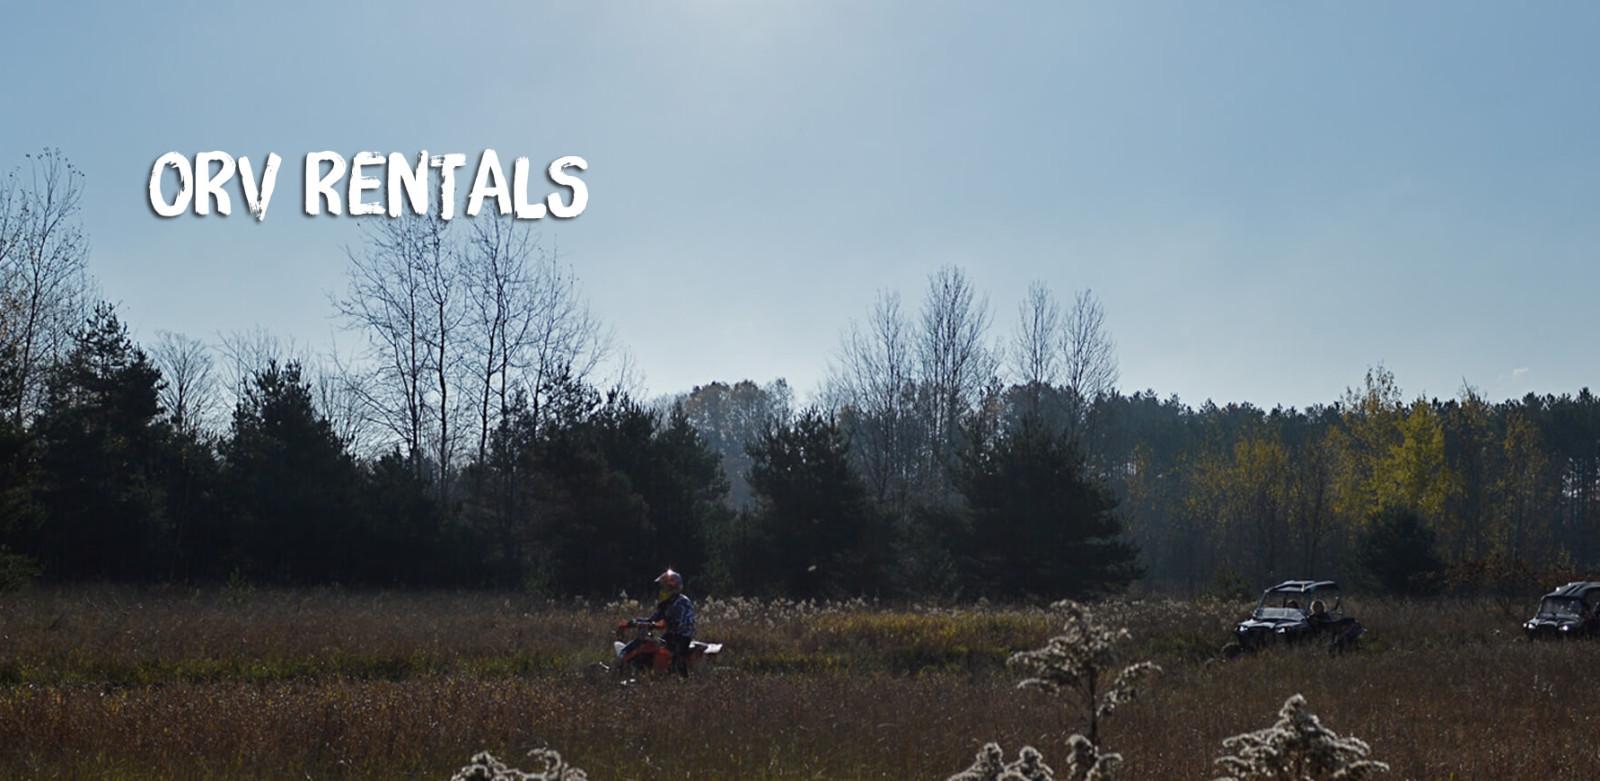 Home Lake County Trails